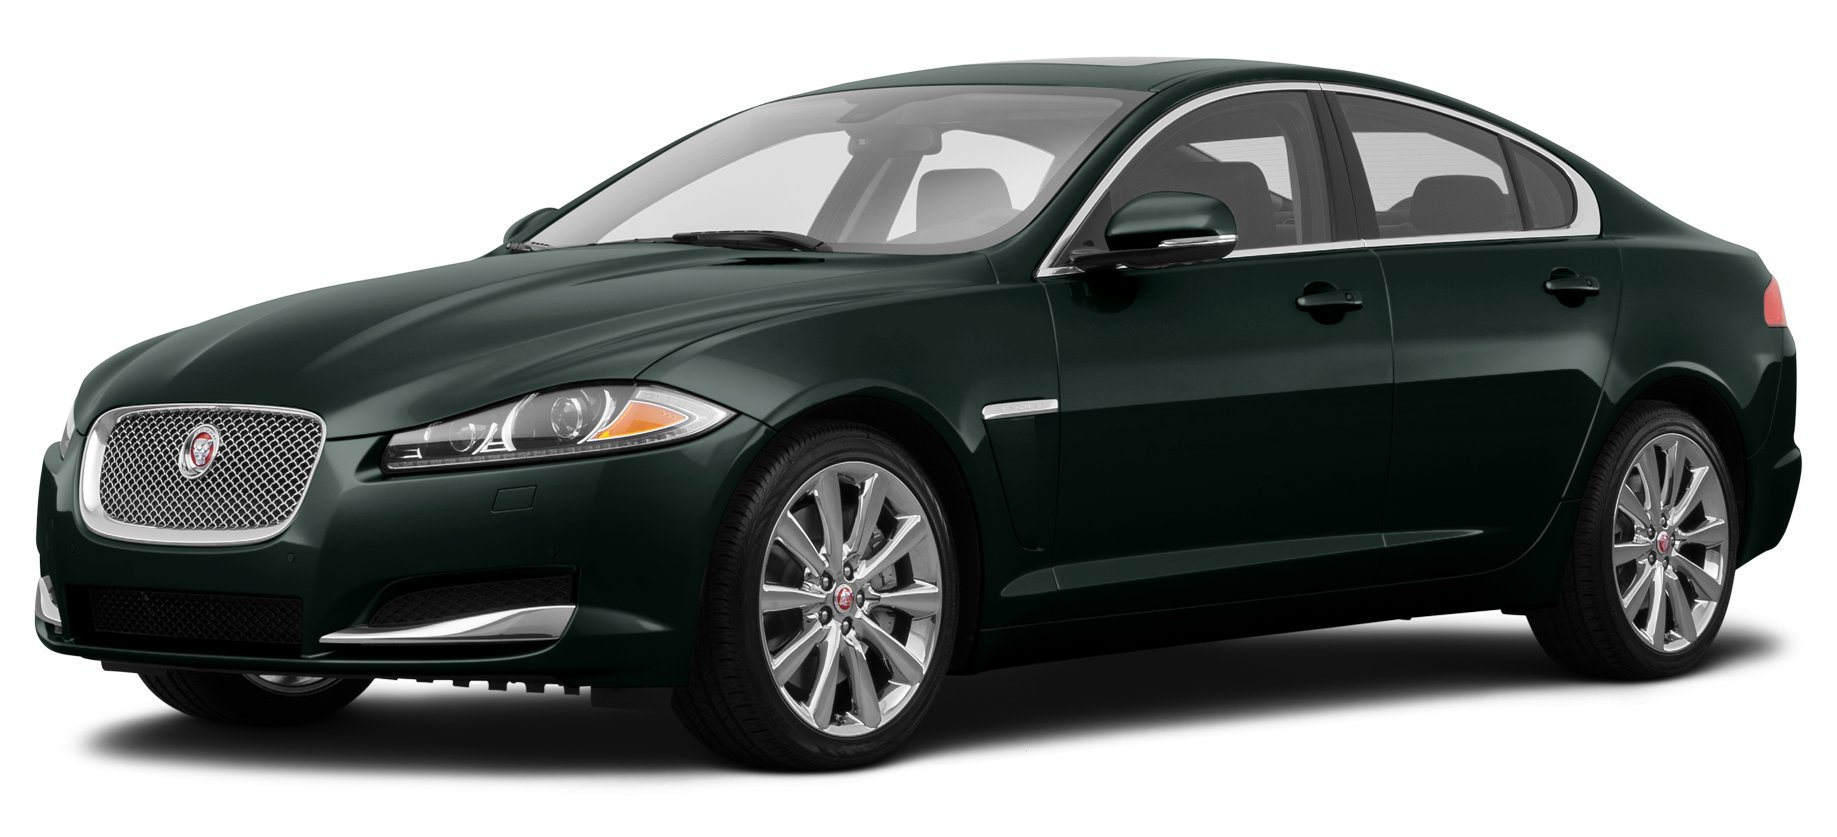 2014 Jaguar XF 4 Cylinder T, 4 Door Sedan Rear Wheel Drive ...